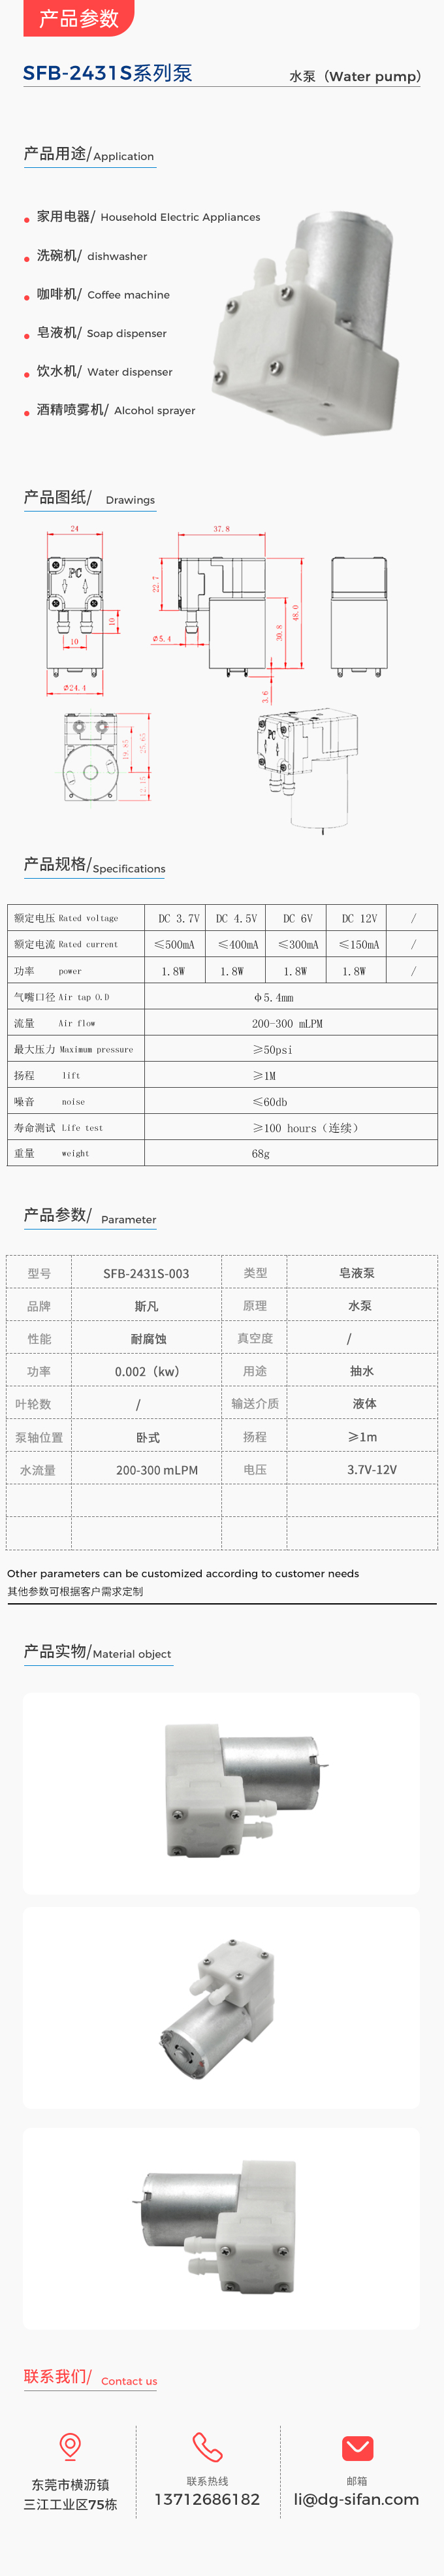 SFB-2431S-003.jpg